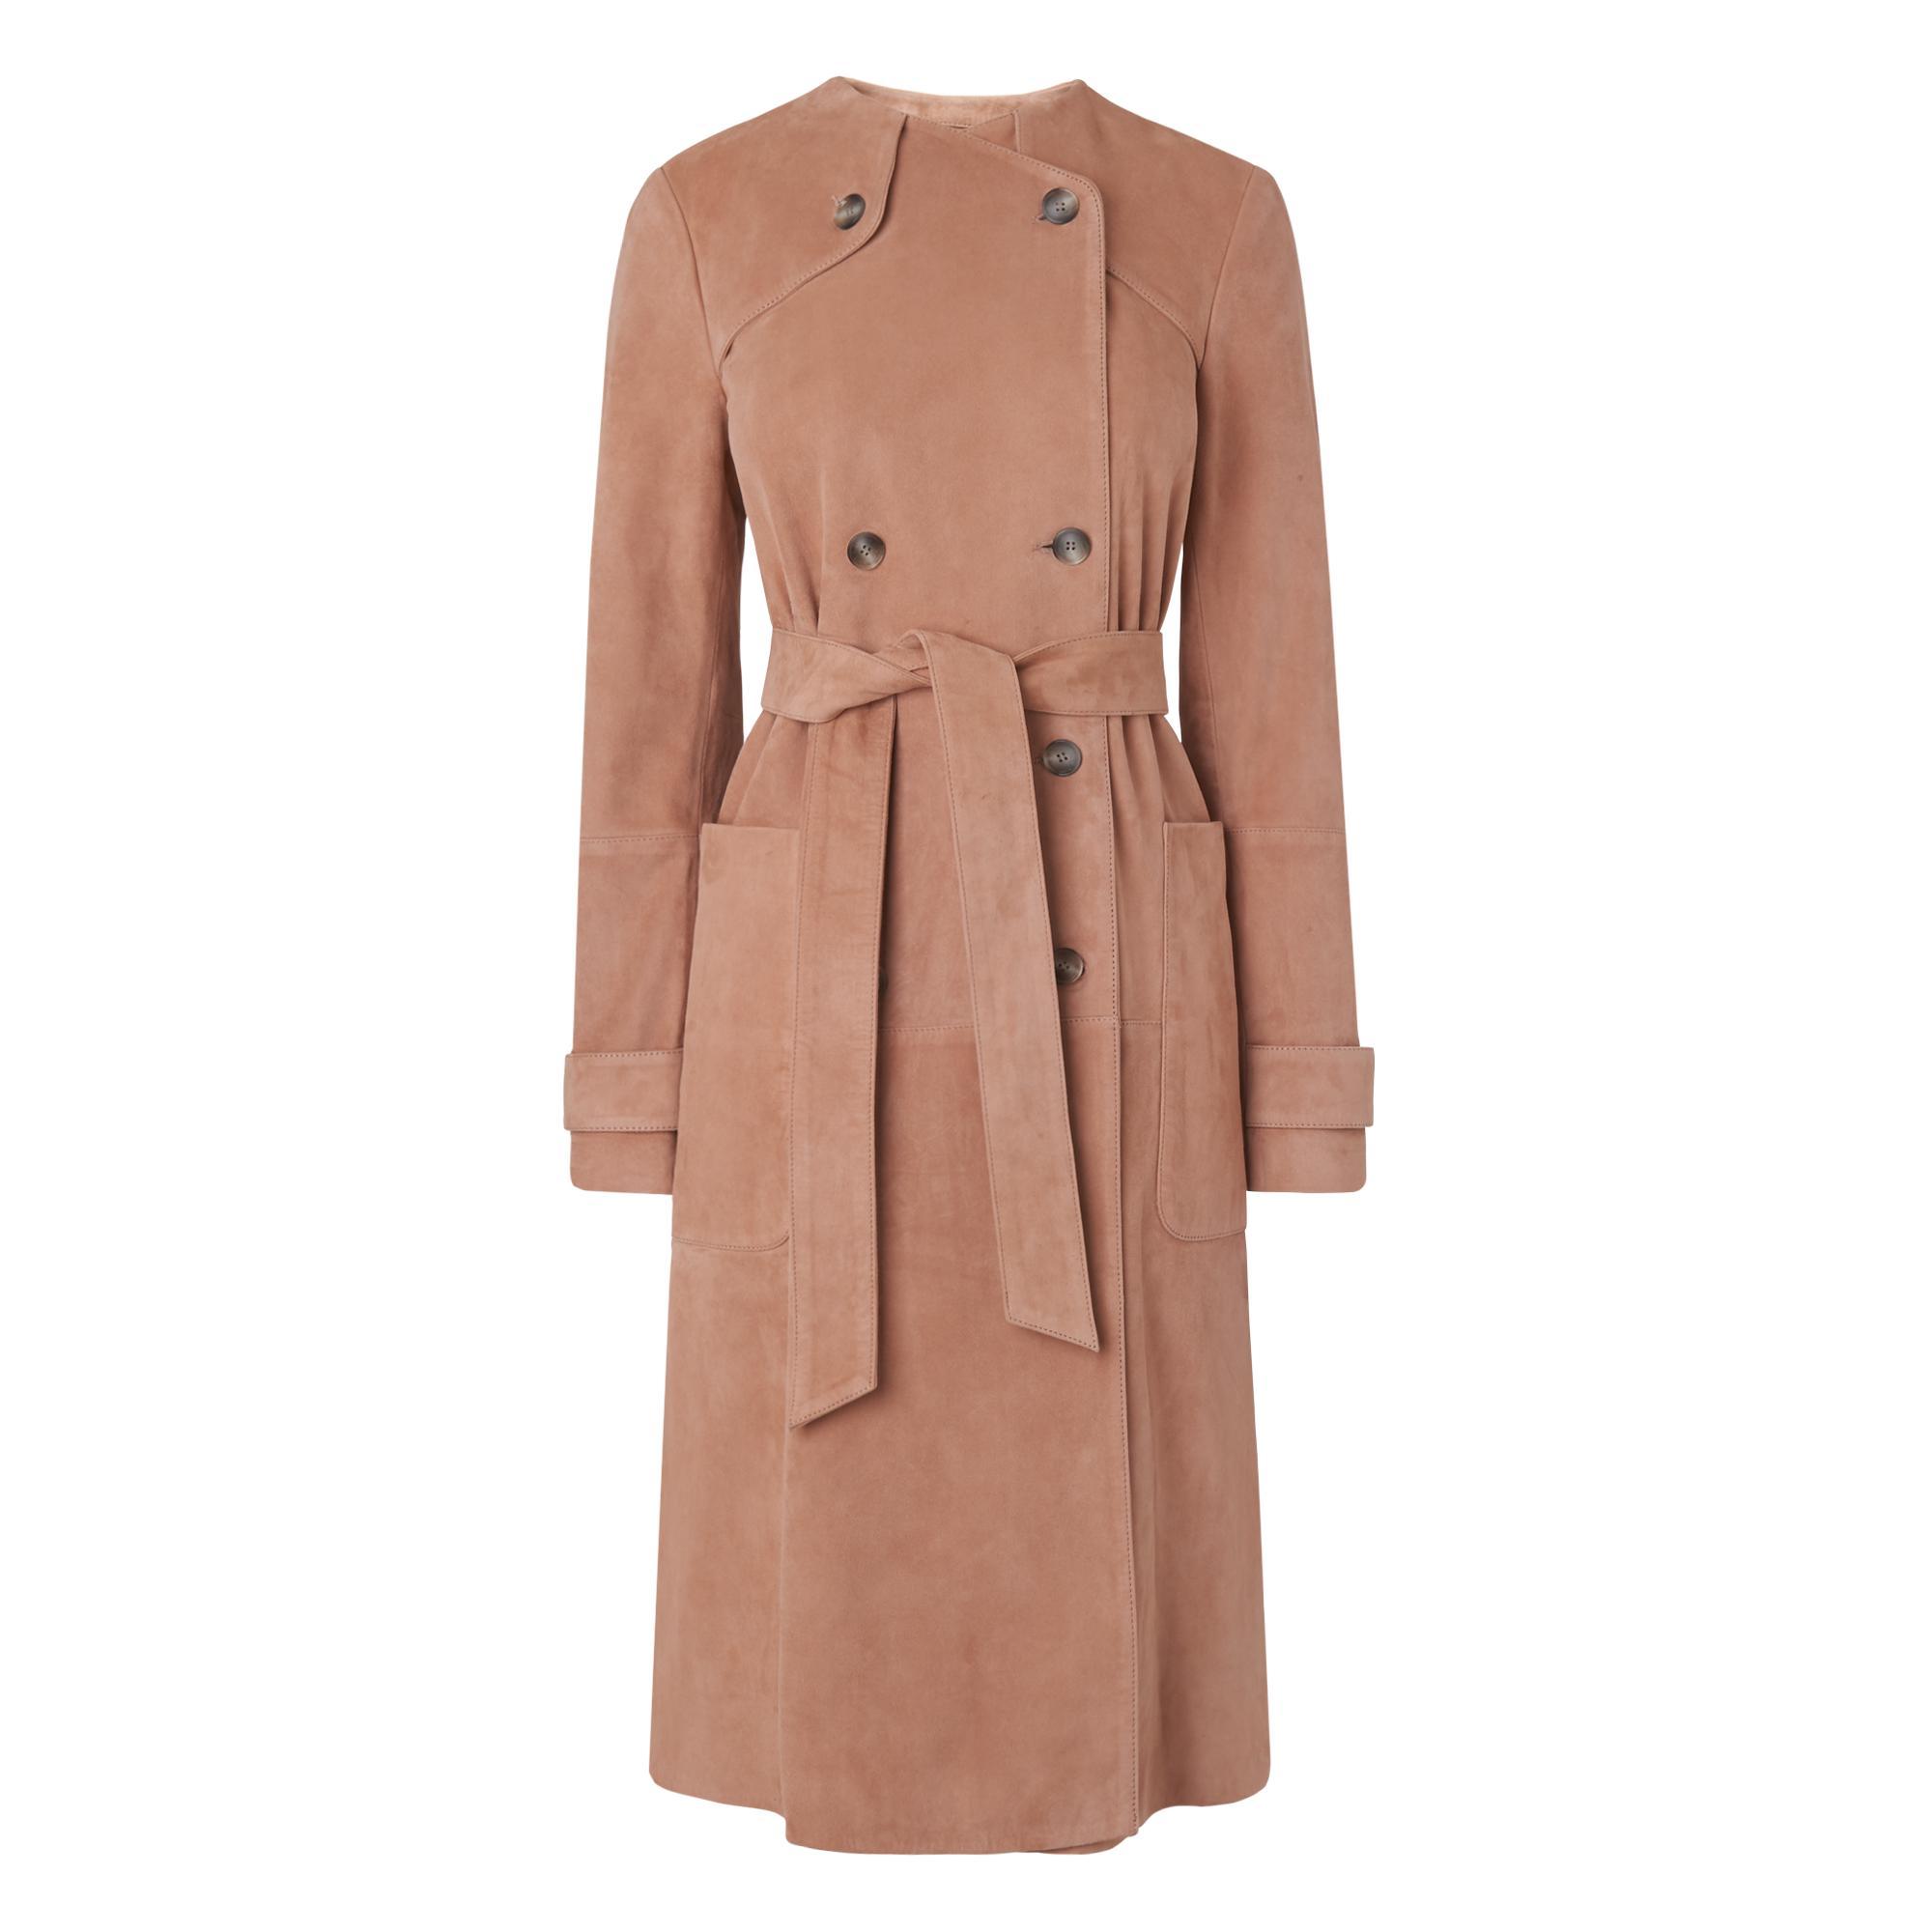 Ria Pink Suede Coat